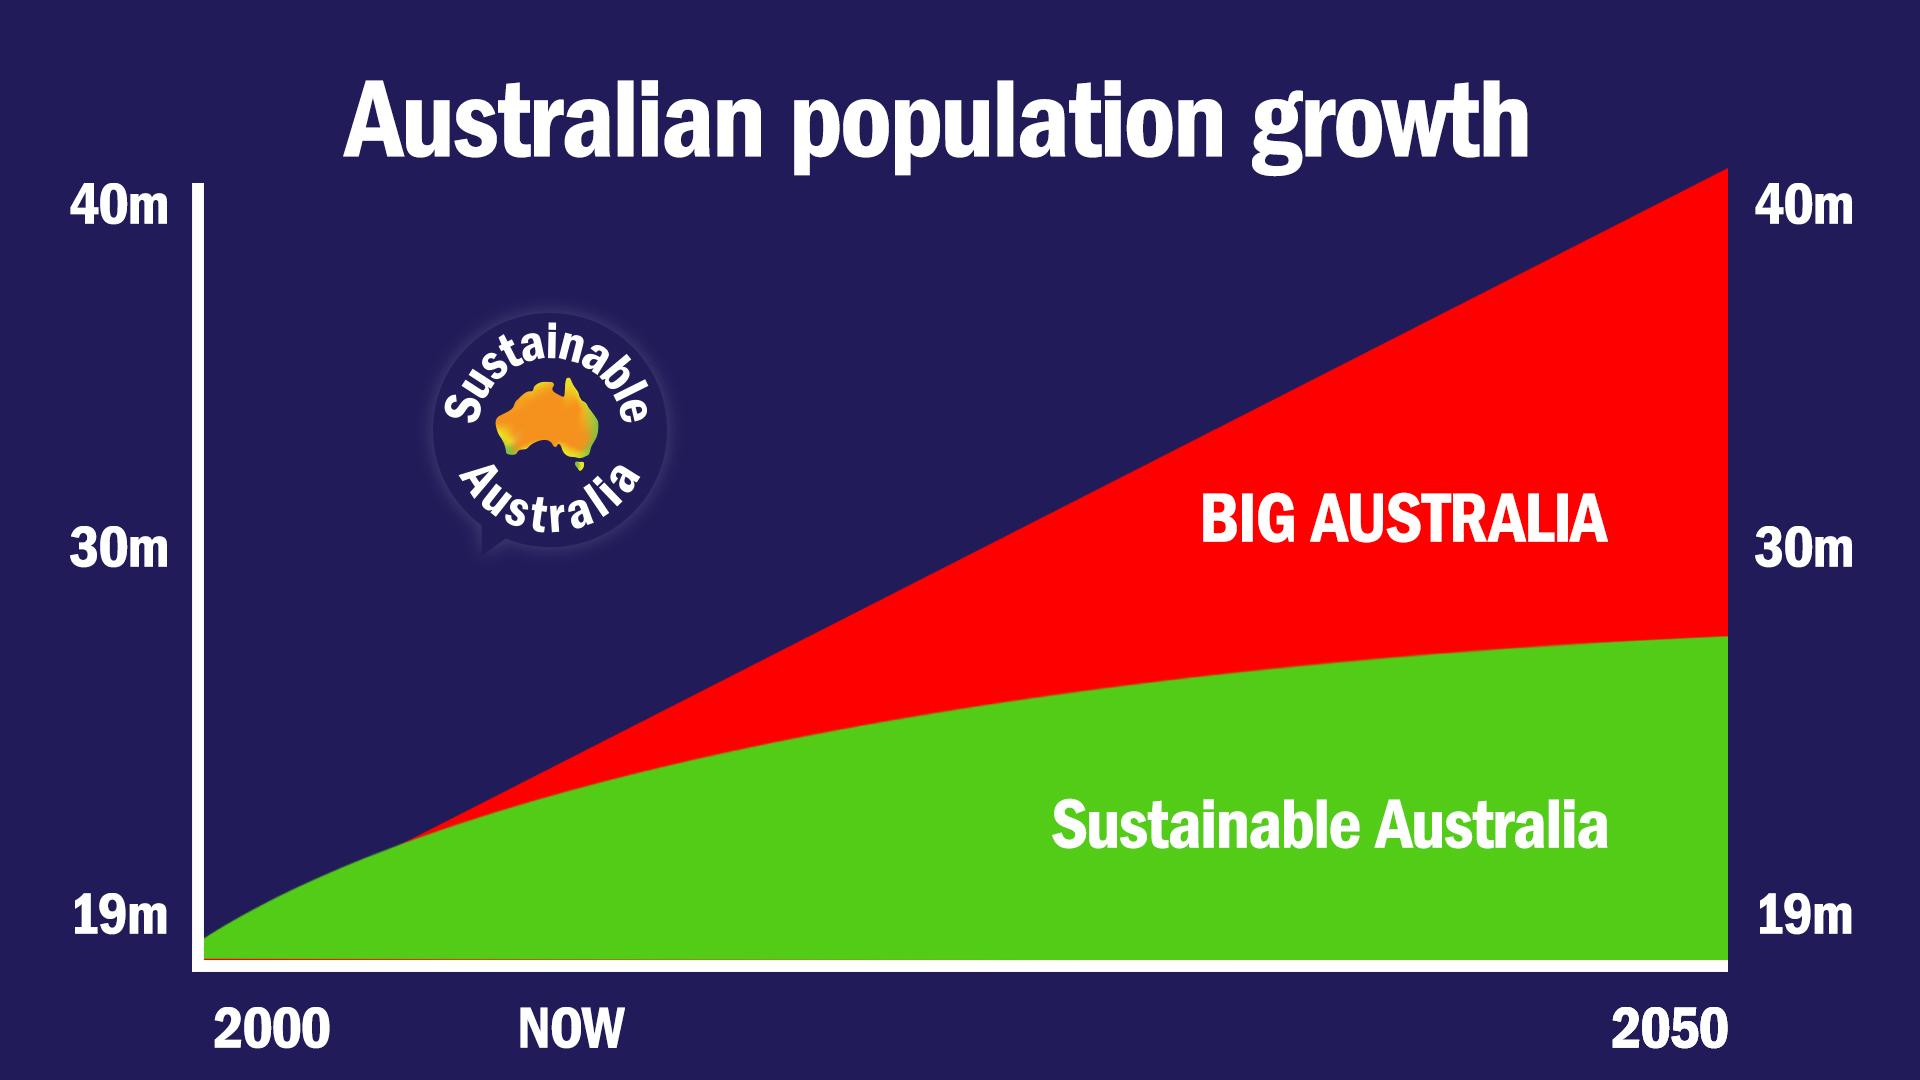 Sustainable_Australia_Versus_Big_Australia-Population.jpg